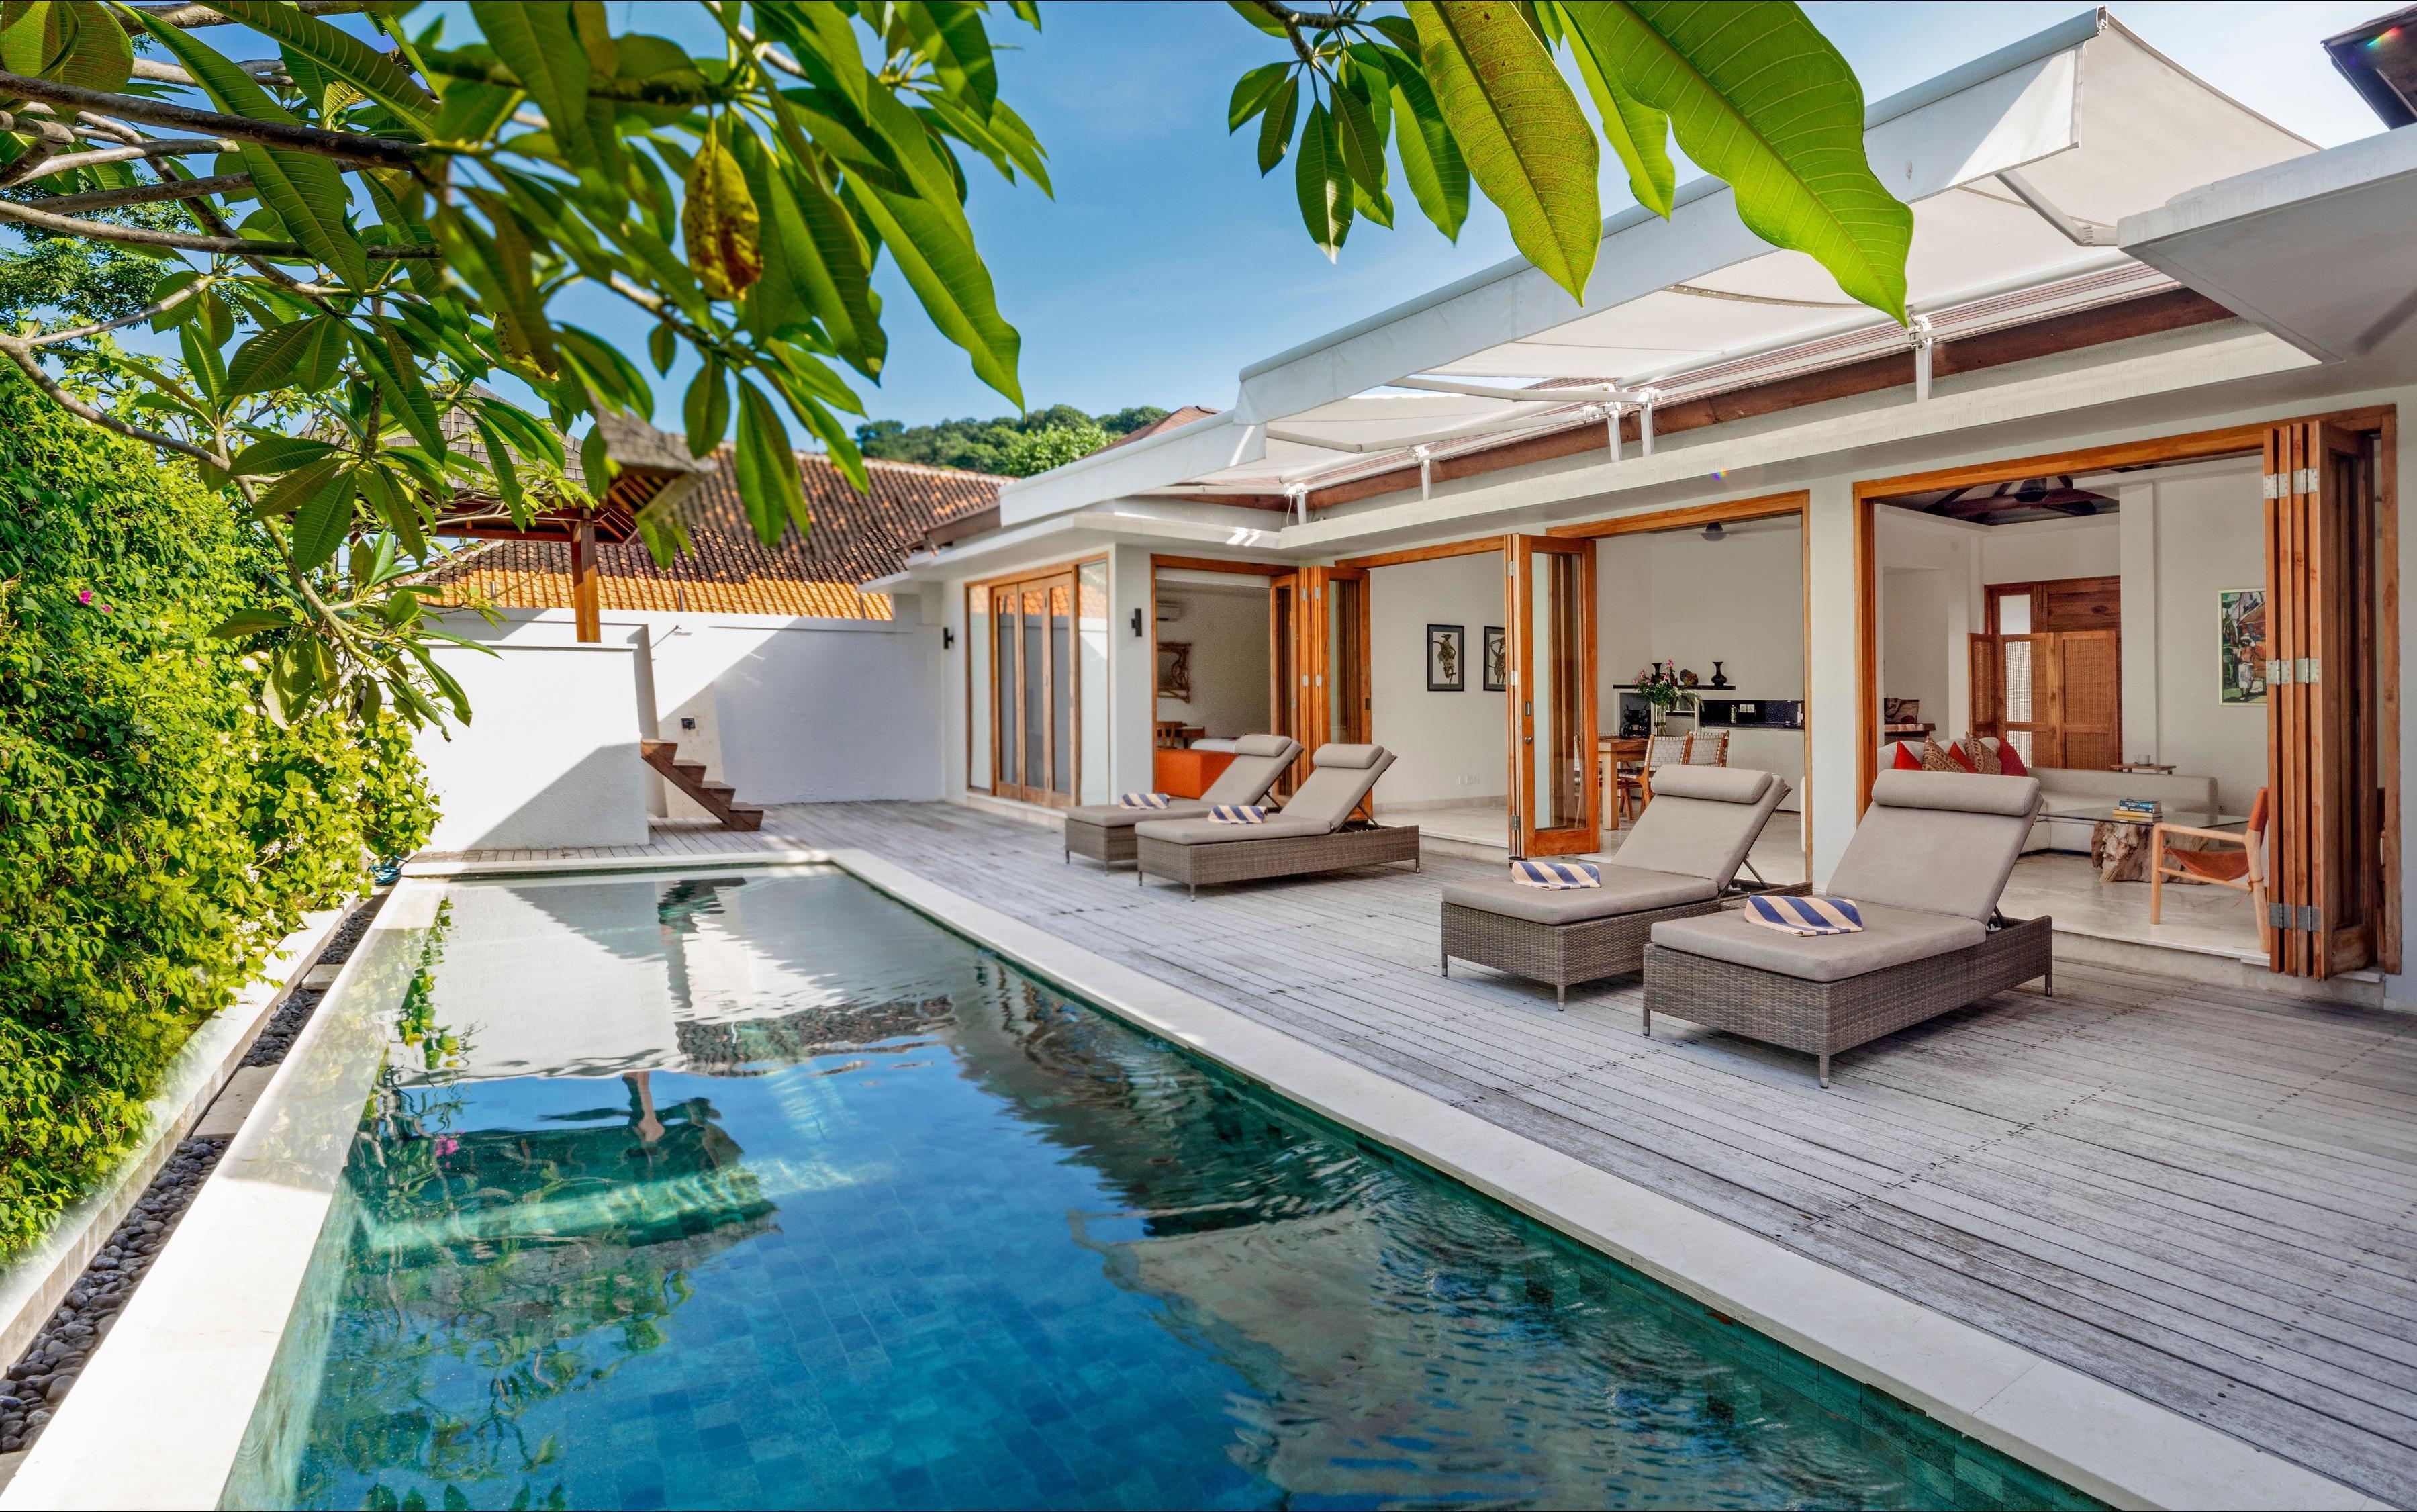 Ko-Ko-Mo Gili Gede 2-bedroom villa